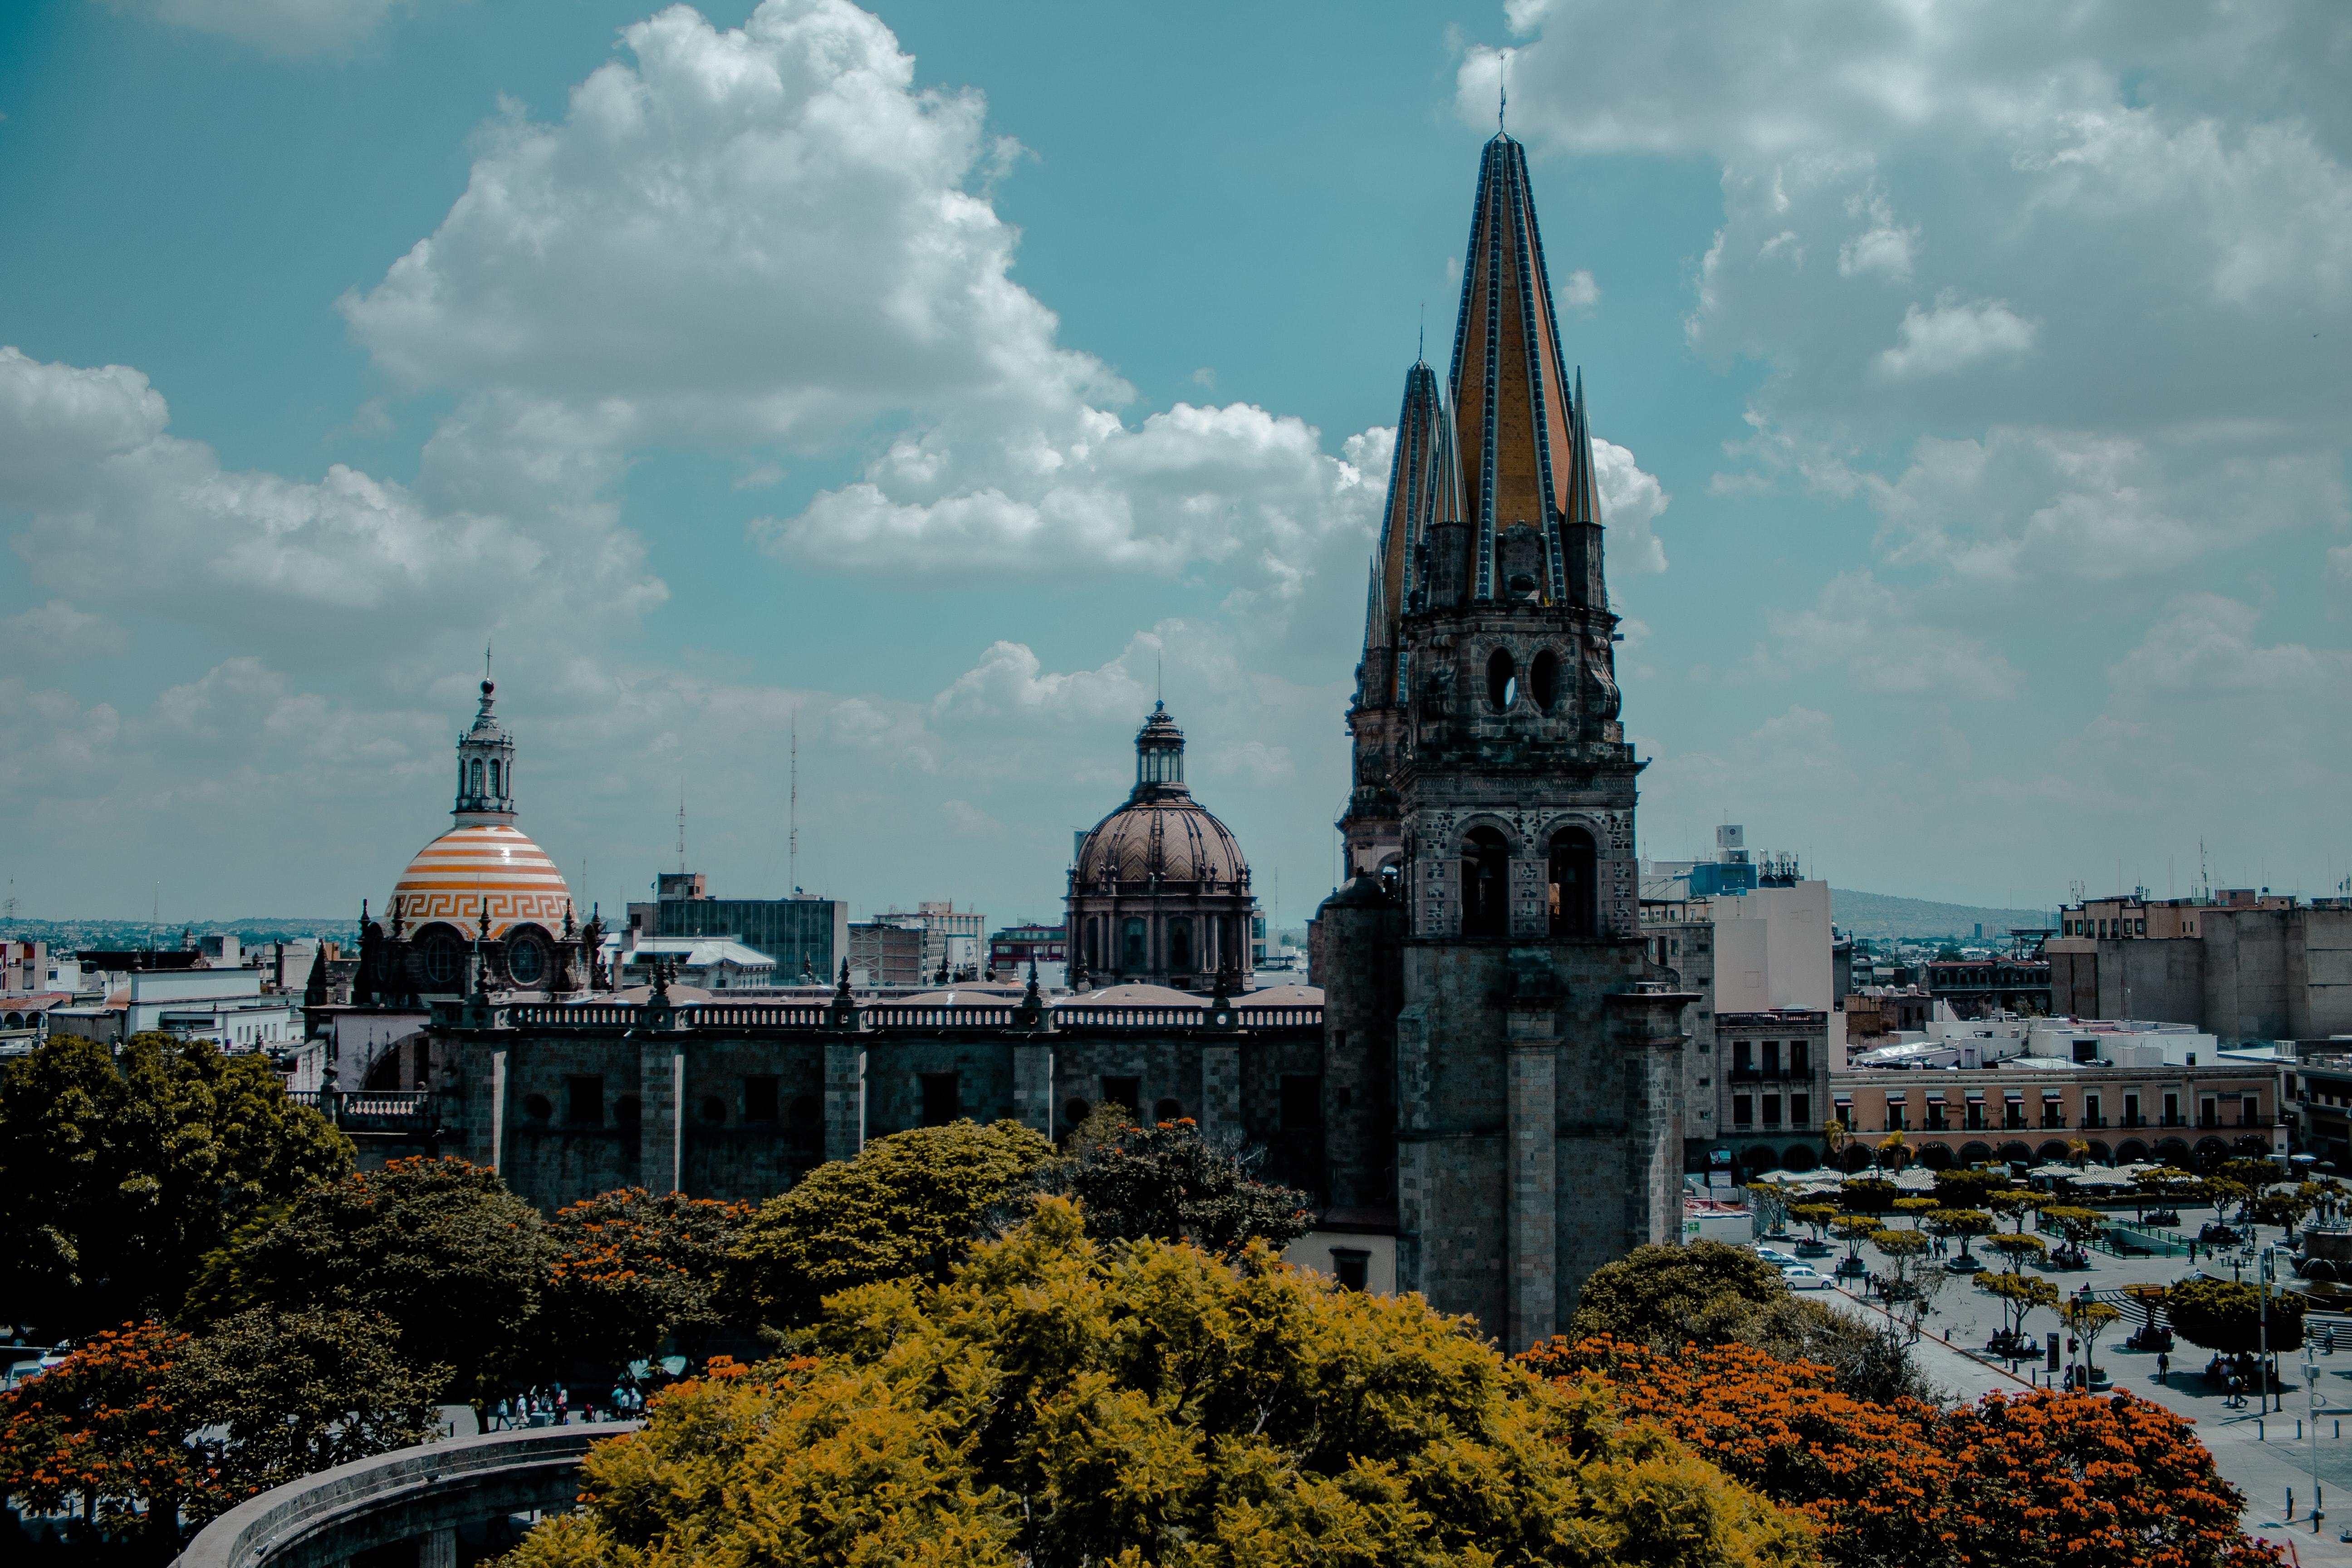 Guadalajara Photo by Daryl.parada